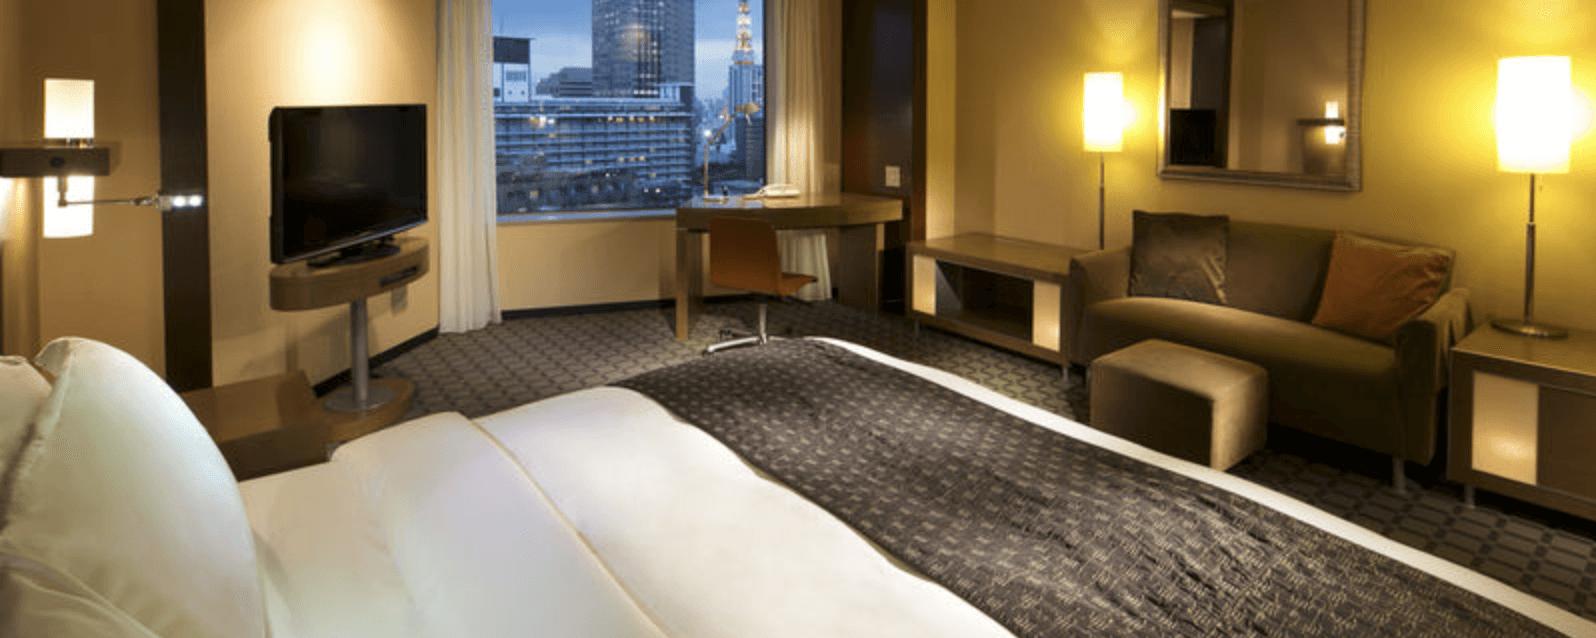 ANAインターコンチネンタルホテル東京のクラシックダブルの部屋